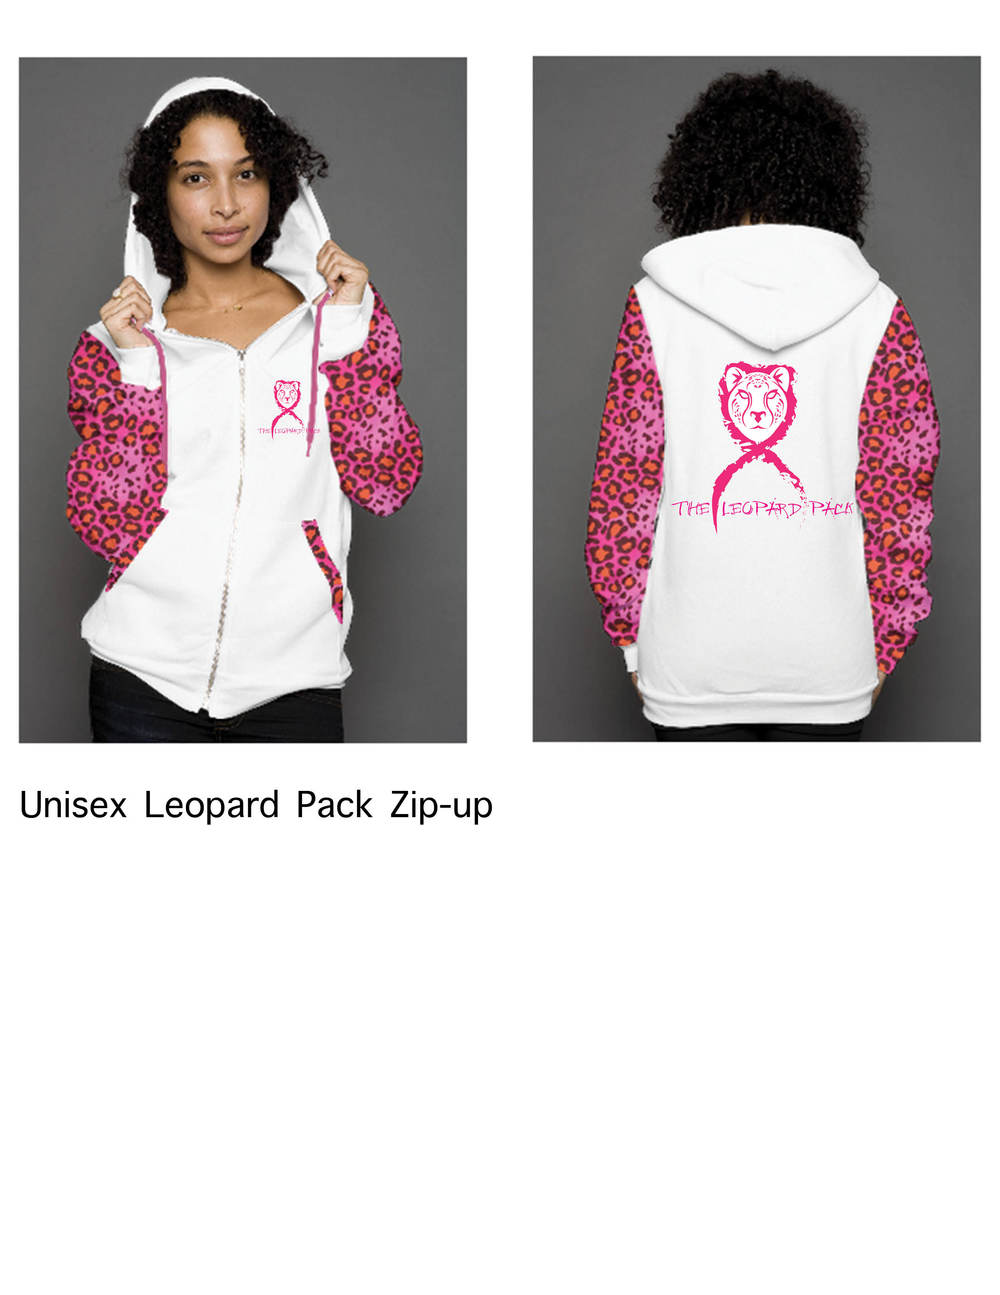 leopardpackclothing2.jpg